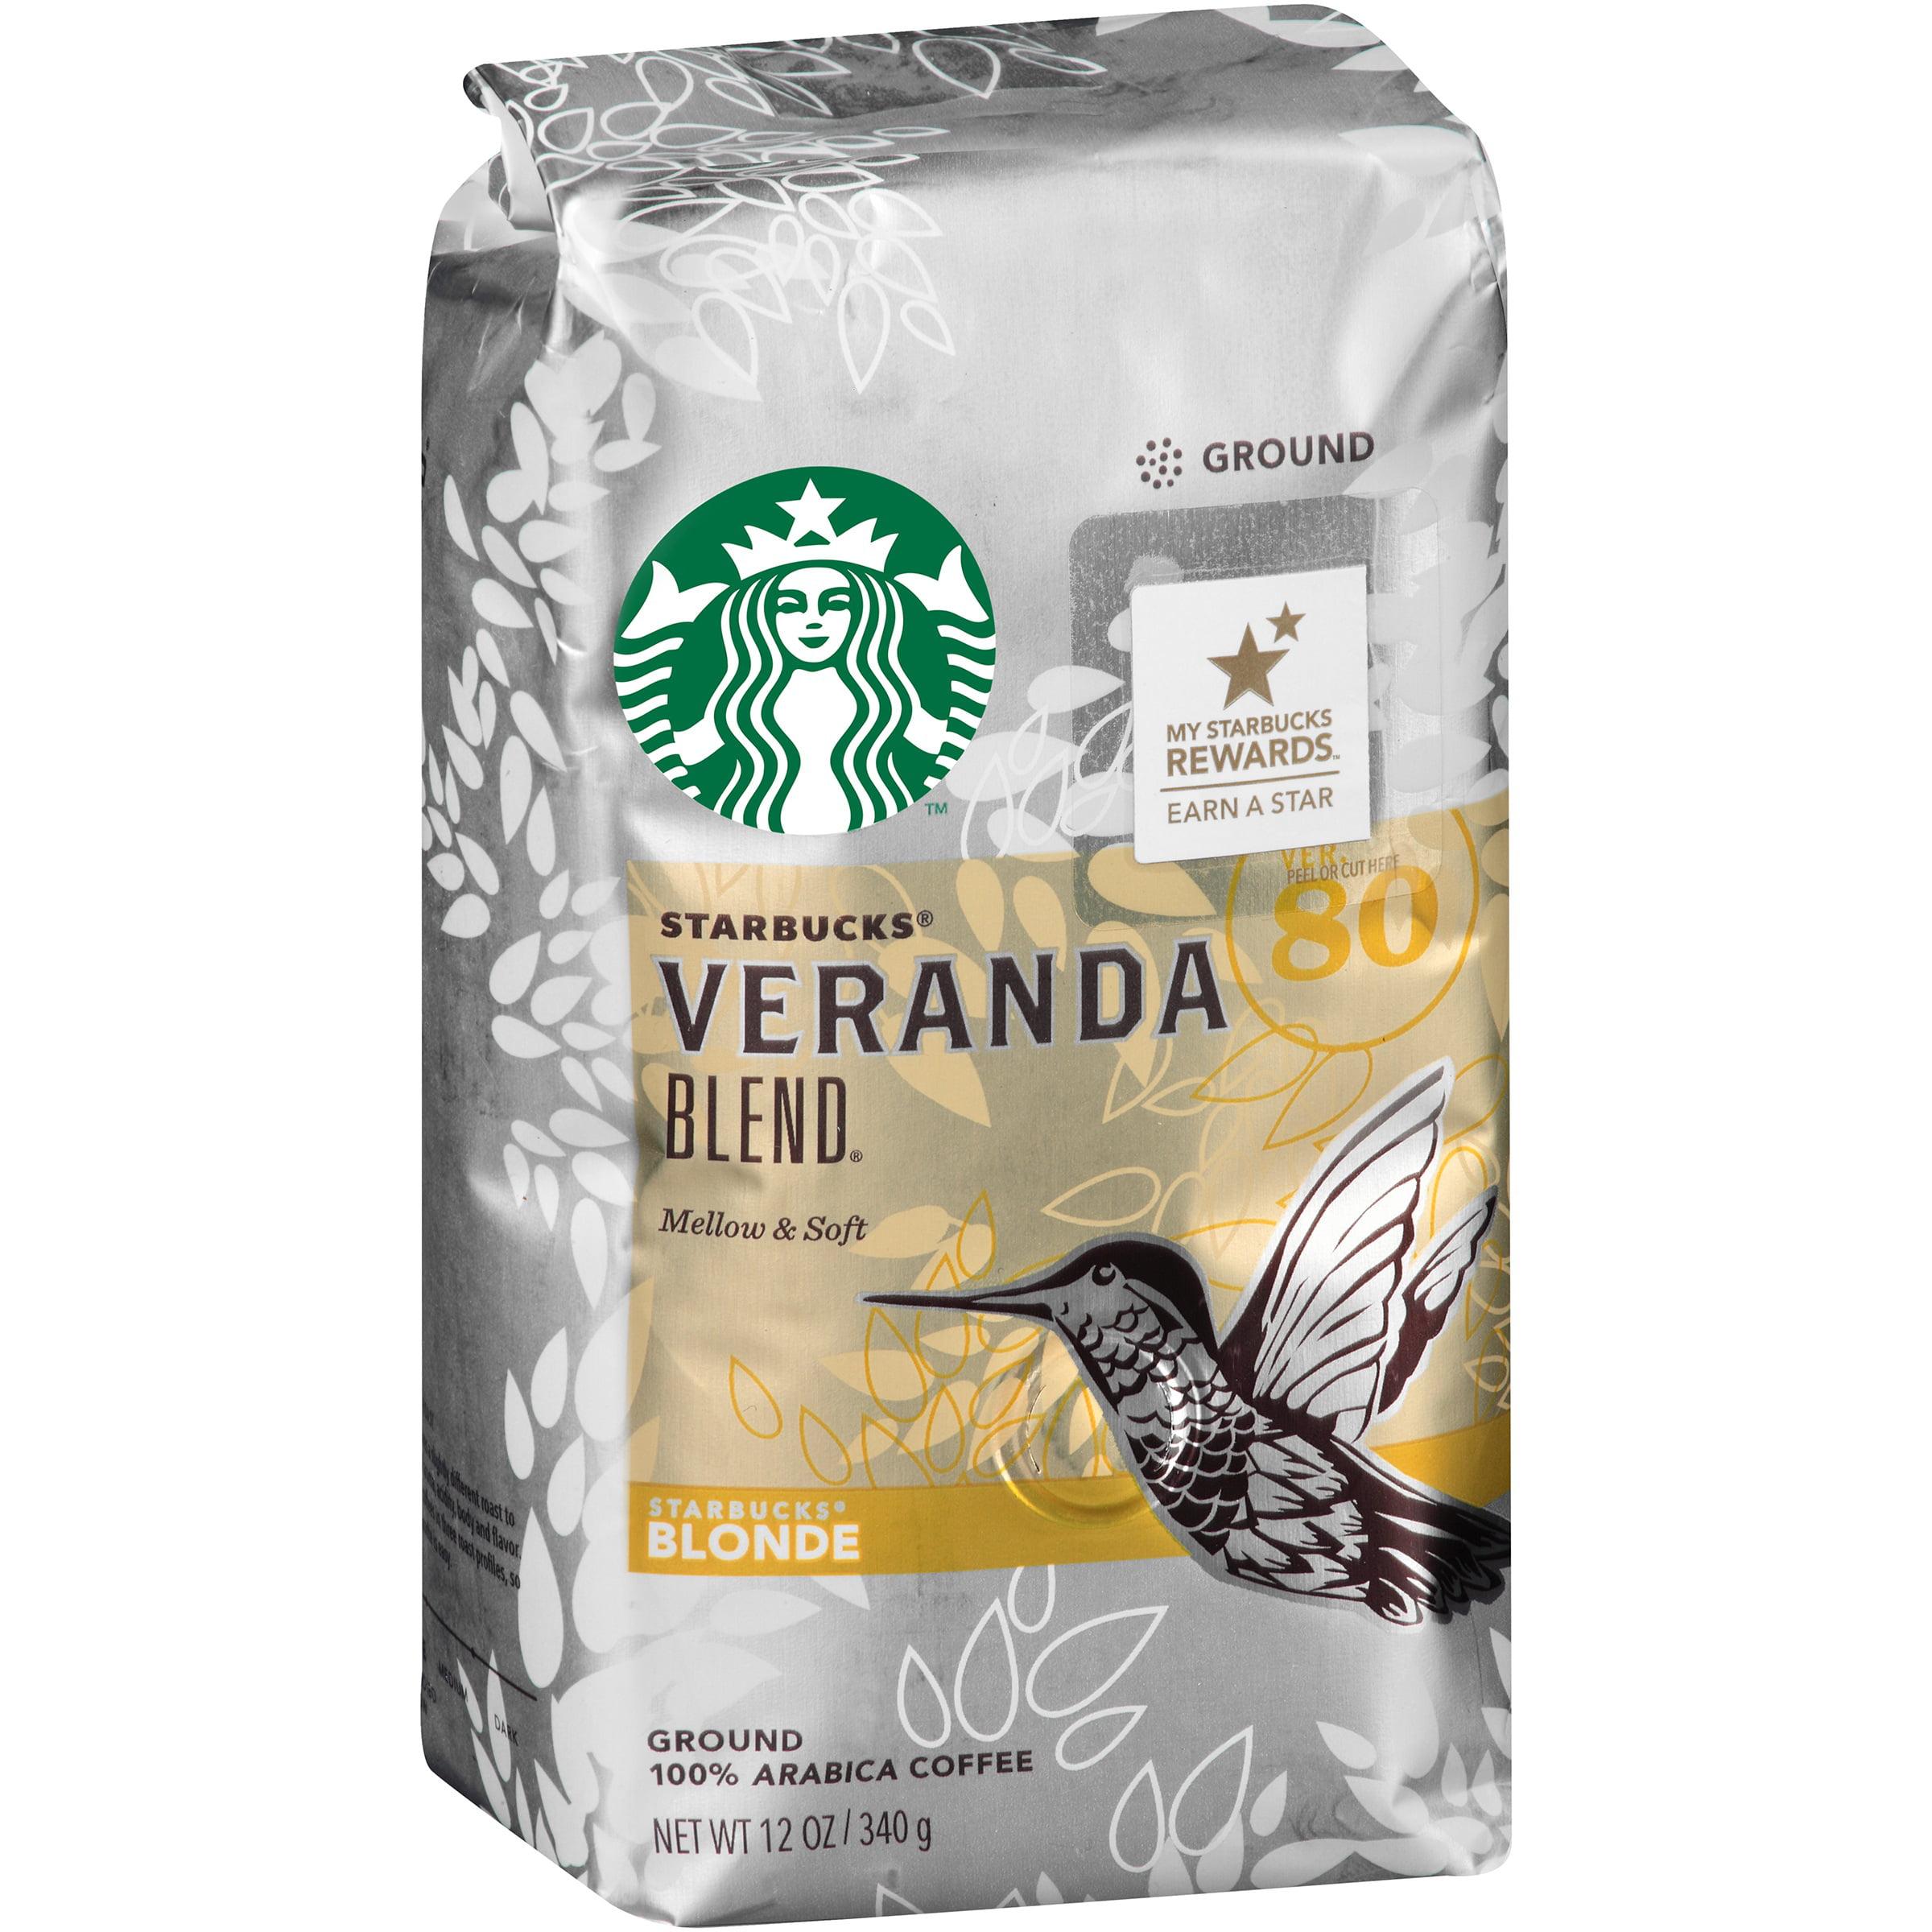 Starbucks Blonde Veranda Blend Ground Coffee, 12 oz